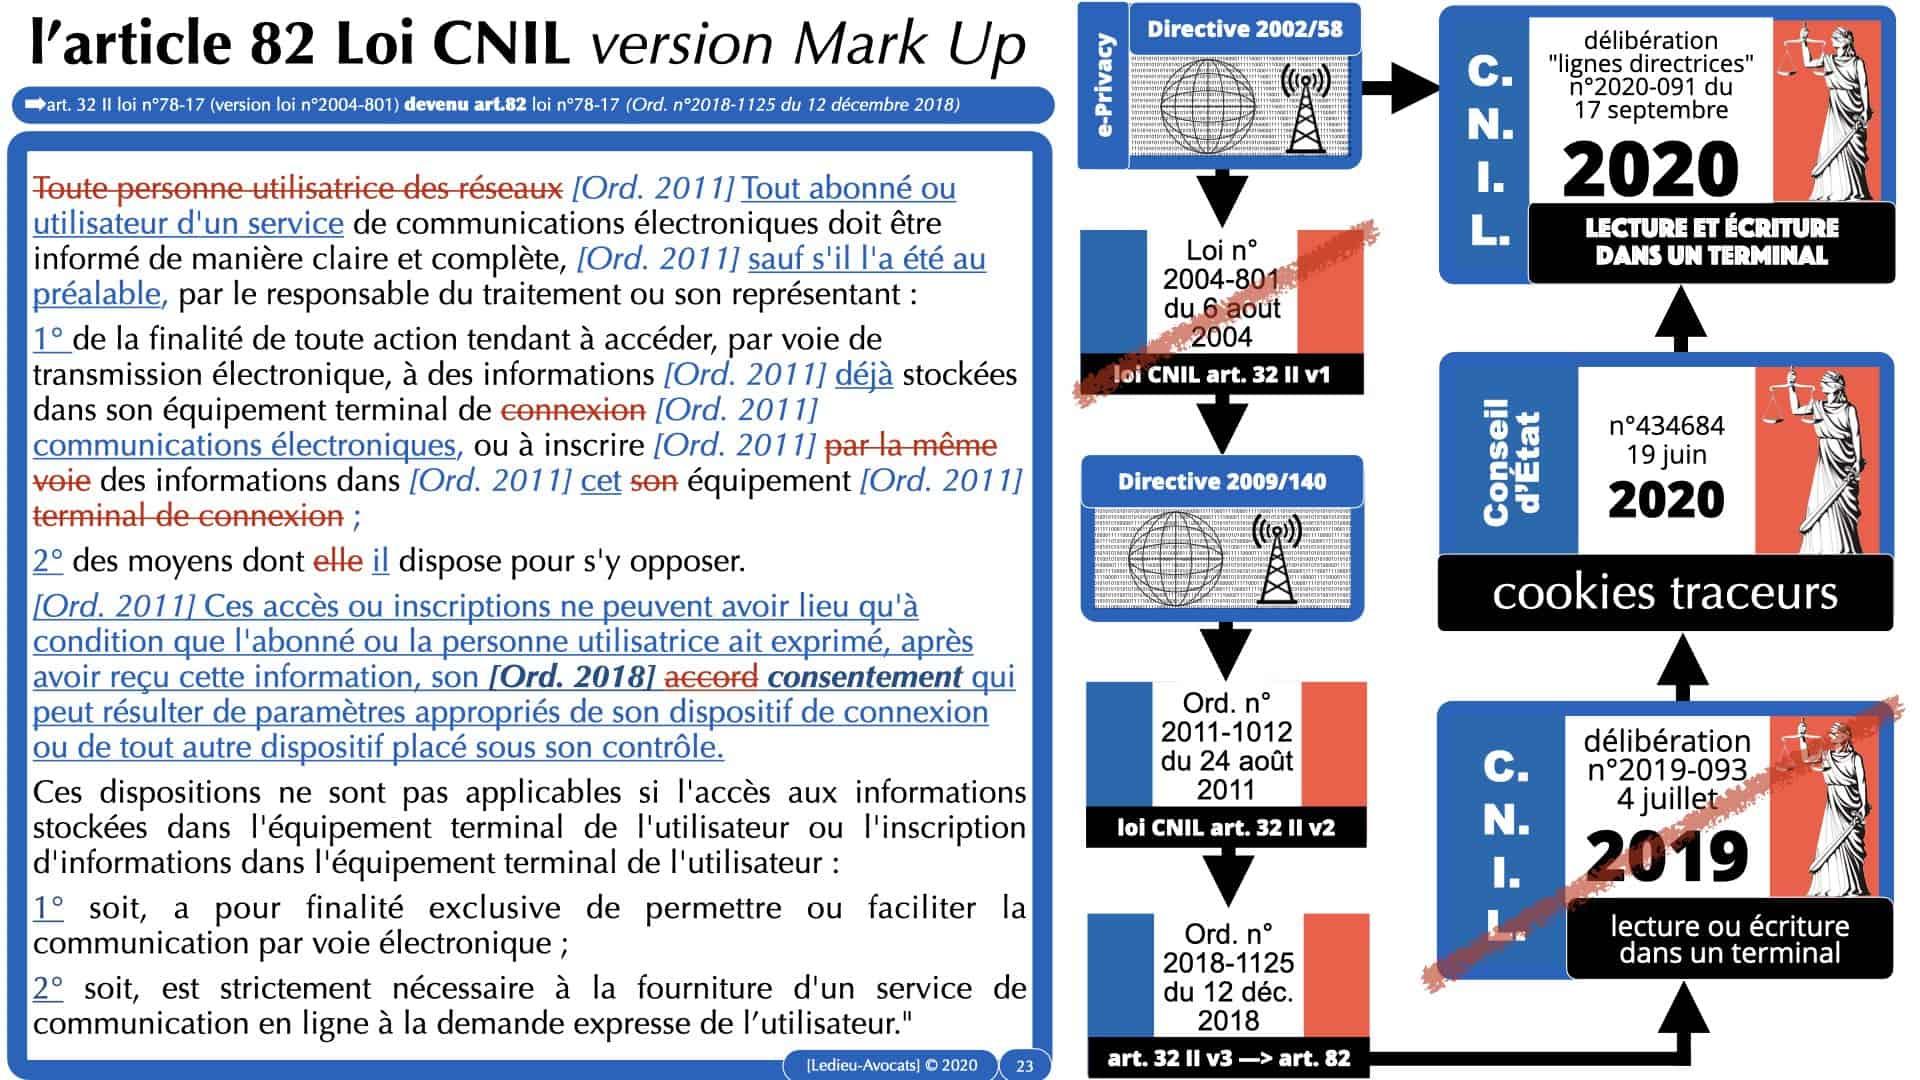 jurisprudence CNIL cookie traceur e-privacy RGPD ©Ledieu-Avocats 14-12-2020.023